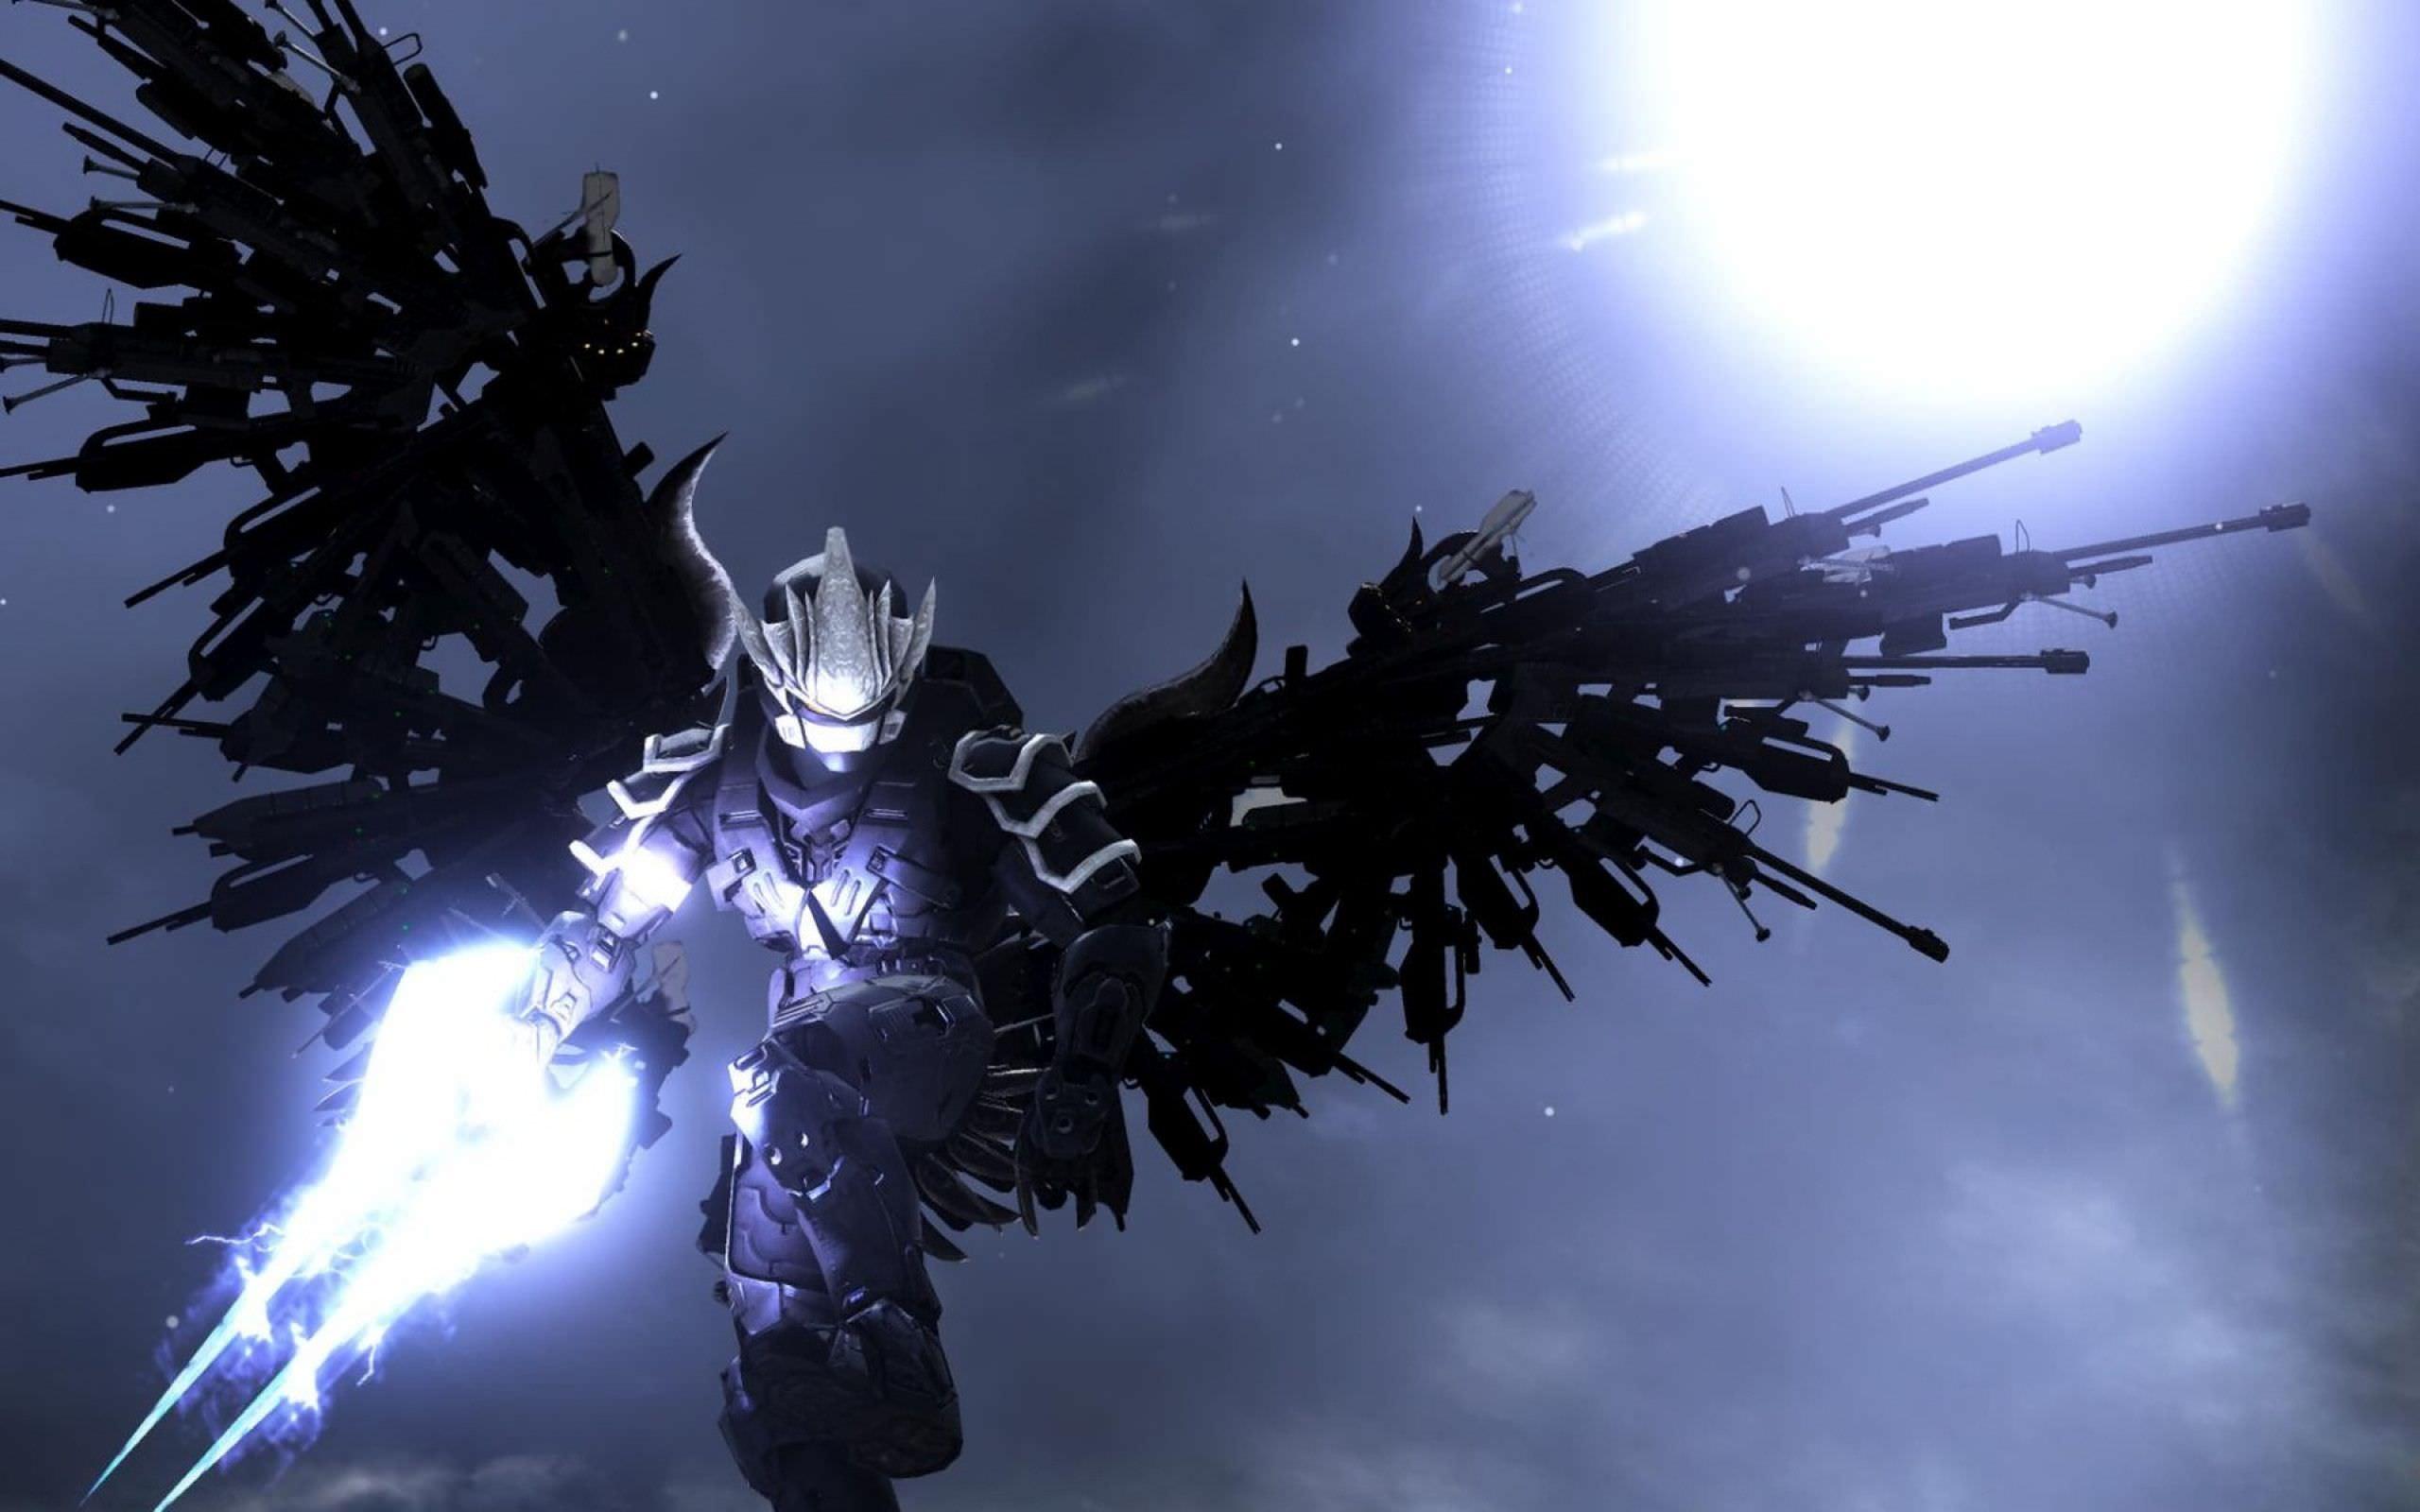 Halo Weapon Wings Wallpaper